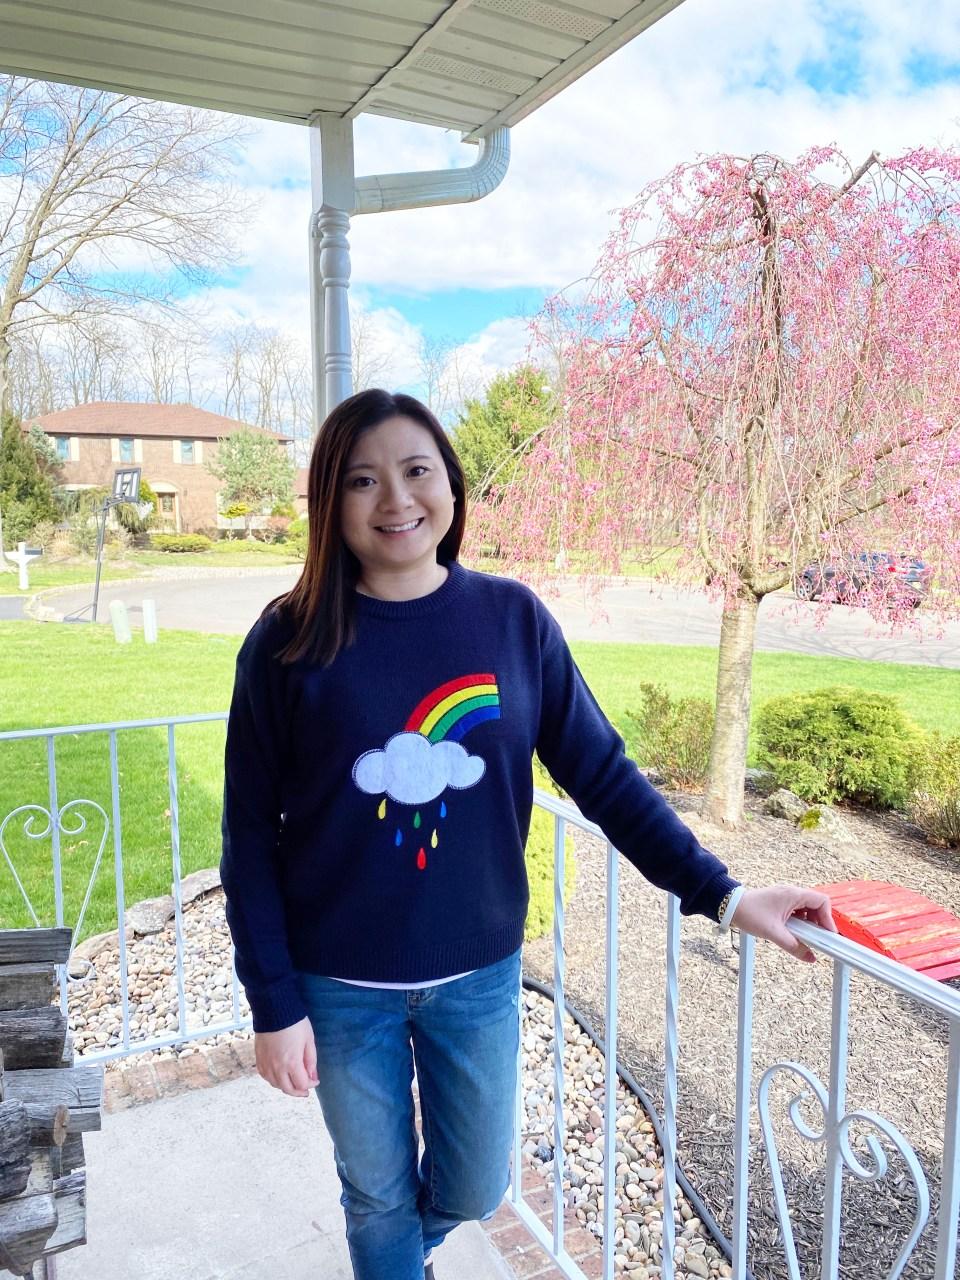 Rainbow & Cloud Sweater 10